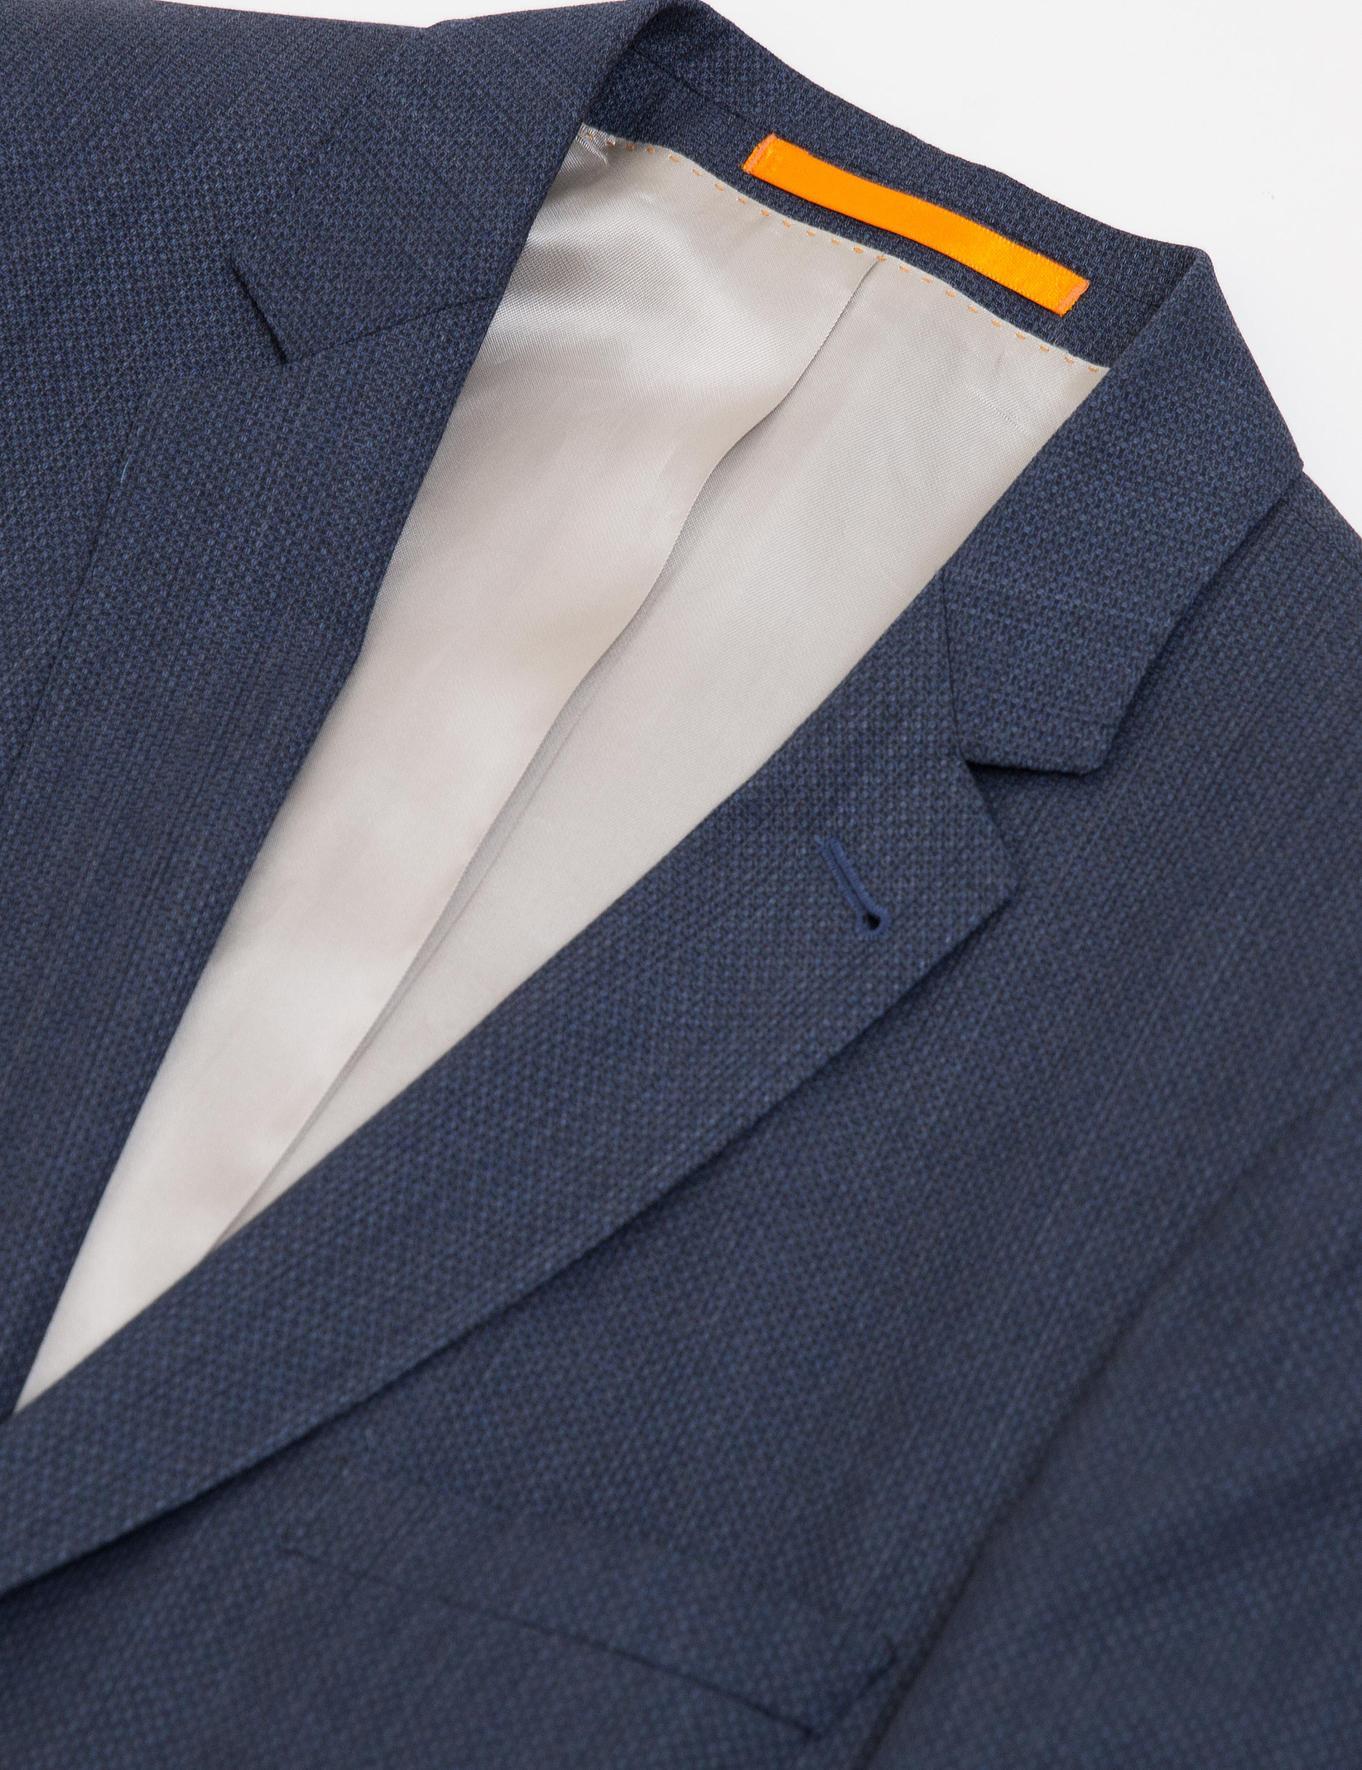 Mavi Slim Fit Ceket - 50185733002